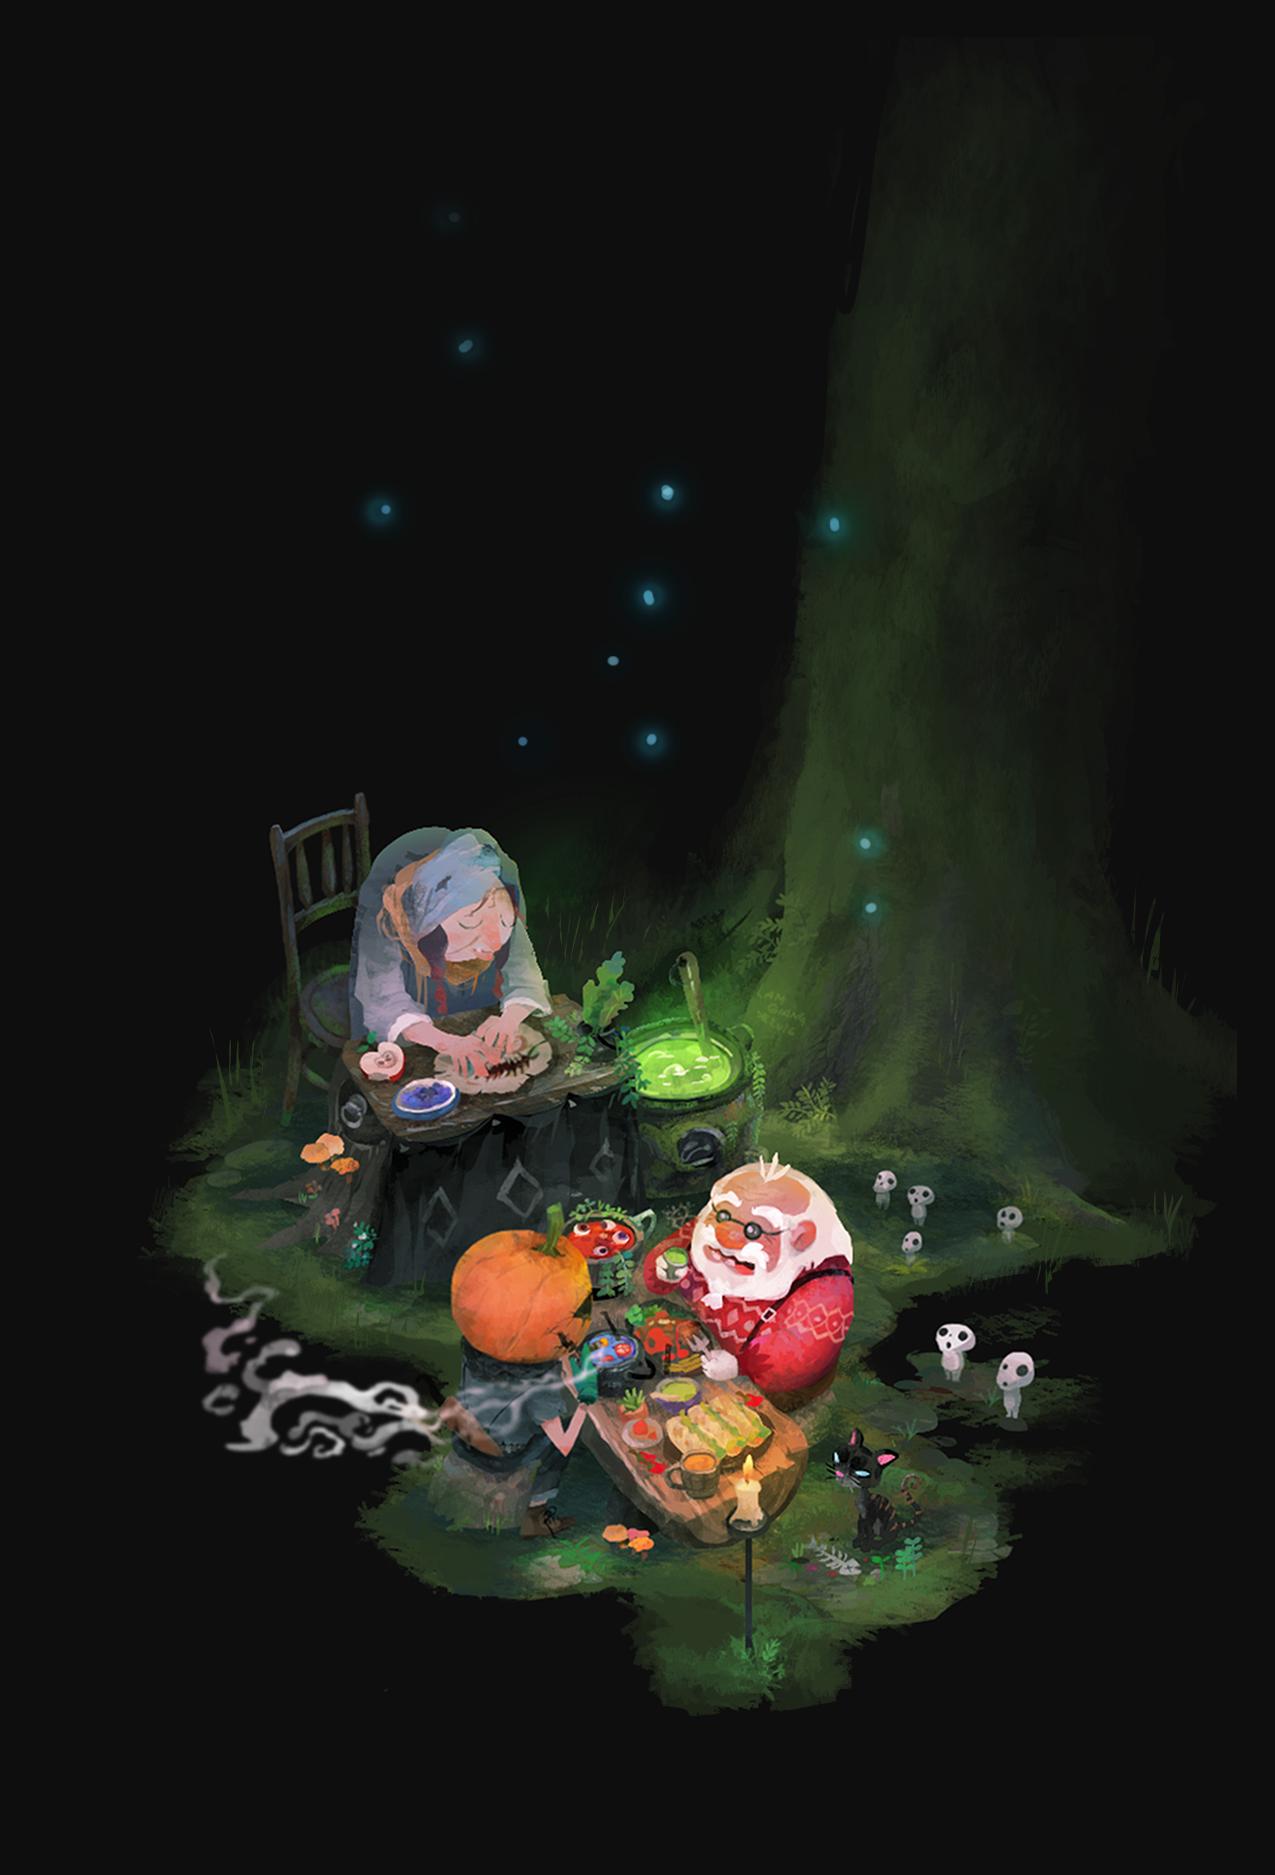 HalloweenMeetChristmas